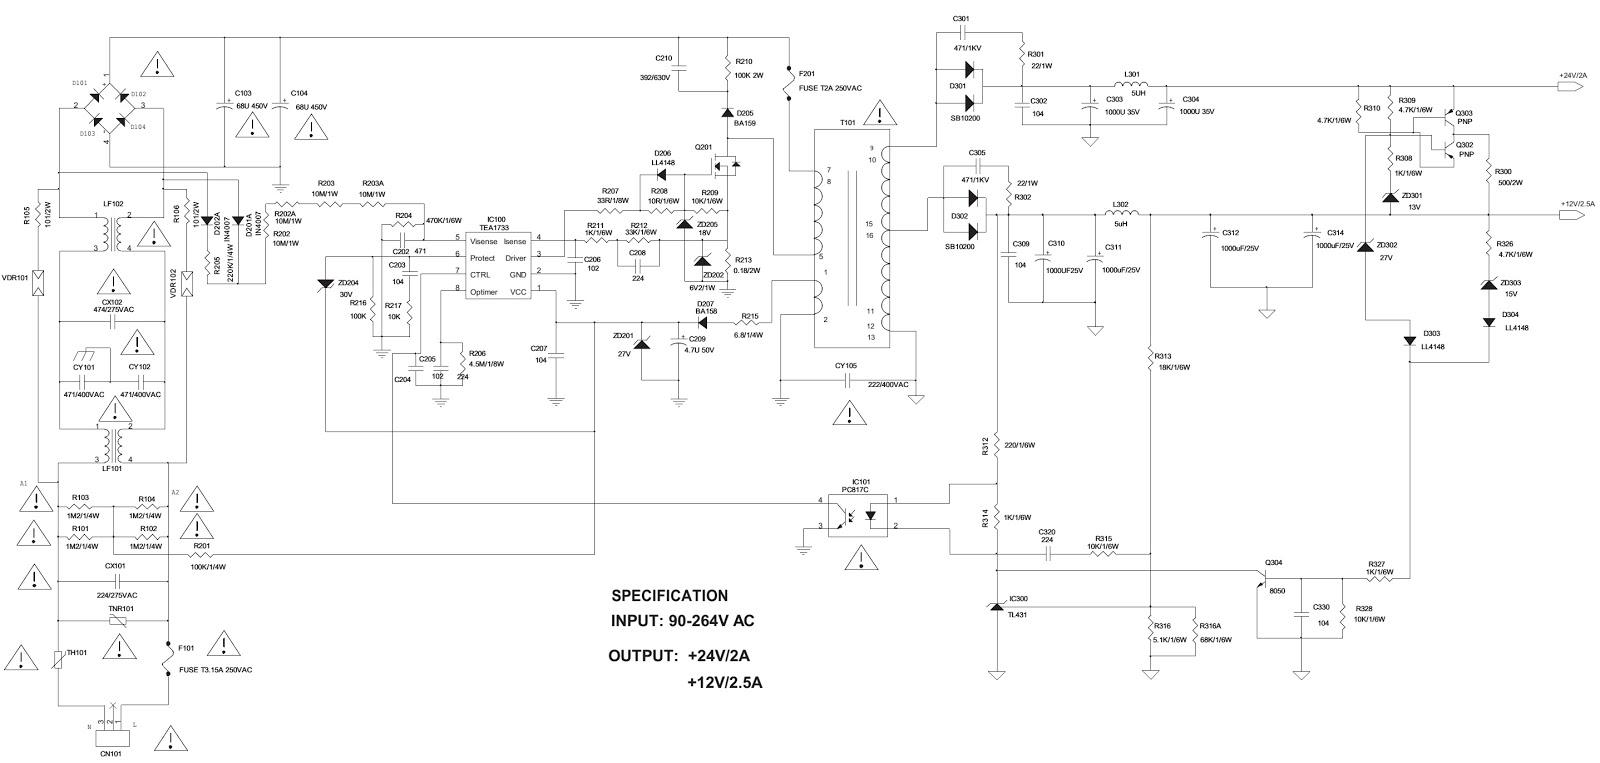 toshiba wiring layout wiring diagram m6toshiba wiring diagram wiring diagram toshiba wiring diagram wiring diagram read [ 1600 x 763 Pixel ]